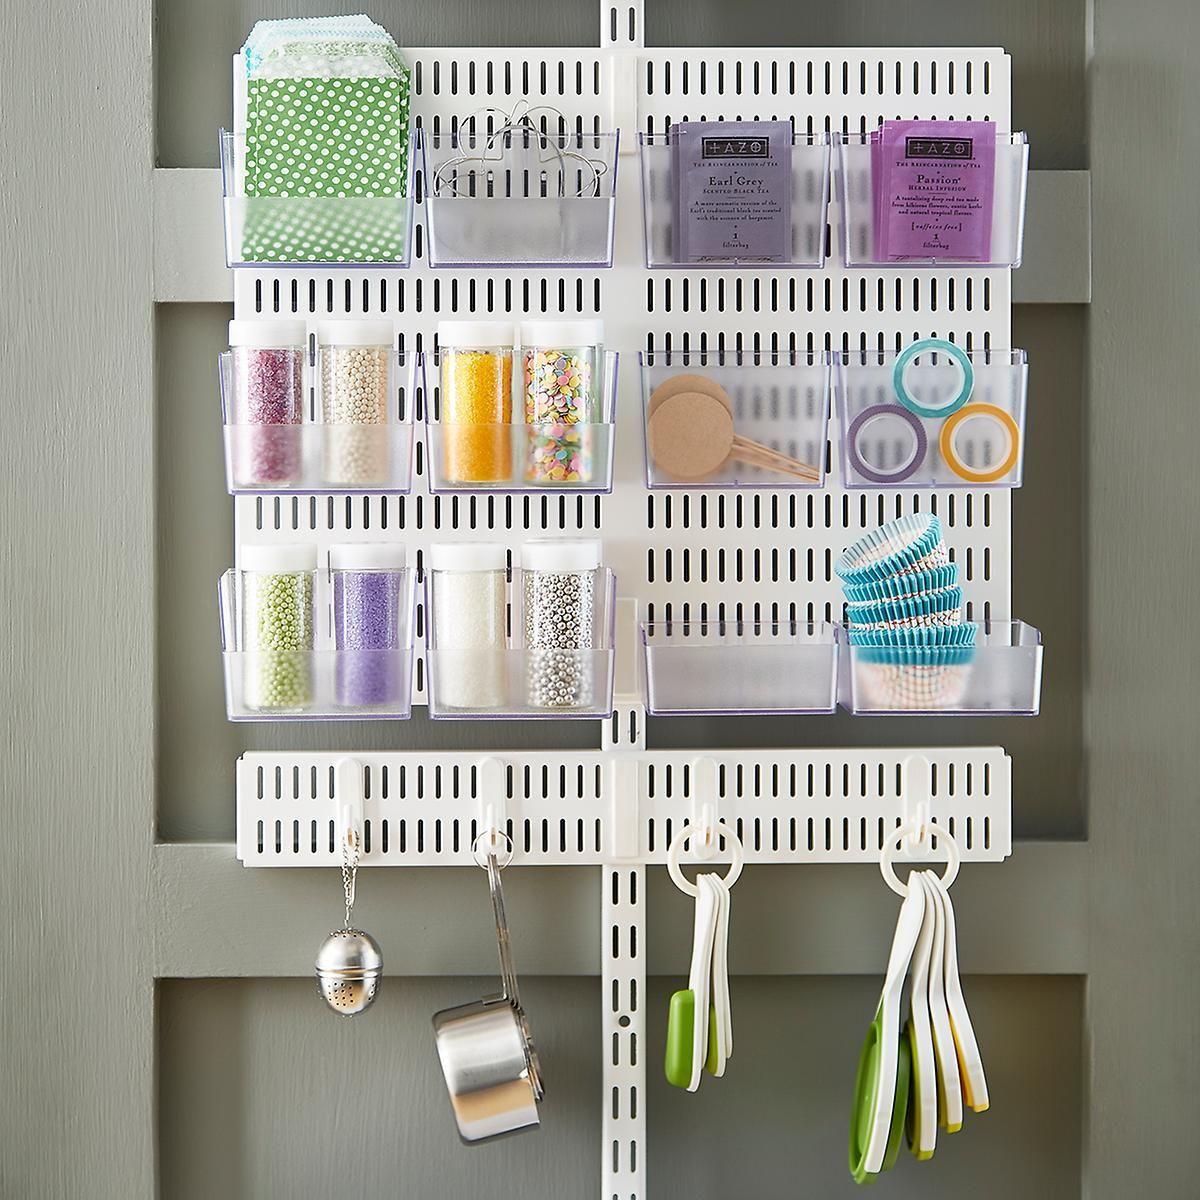 Pantry Door Storage Solutions: Elfa Utility White Mesh Pantry Door & Wall Rack